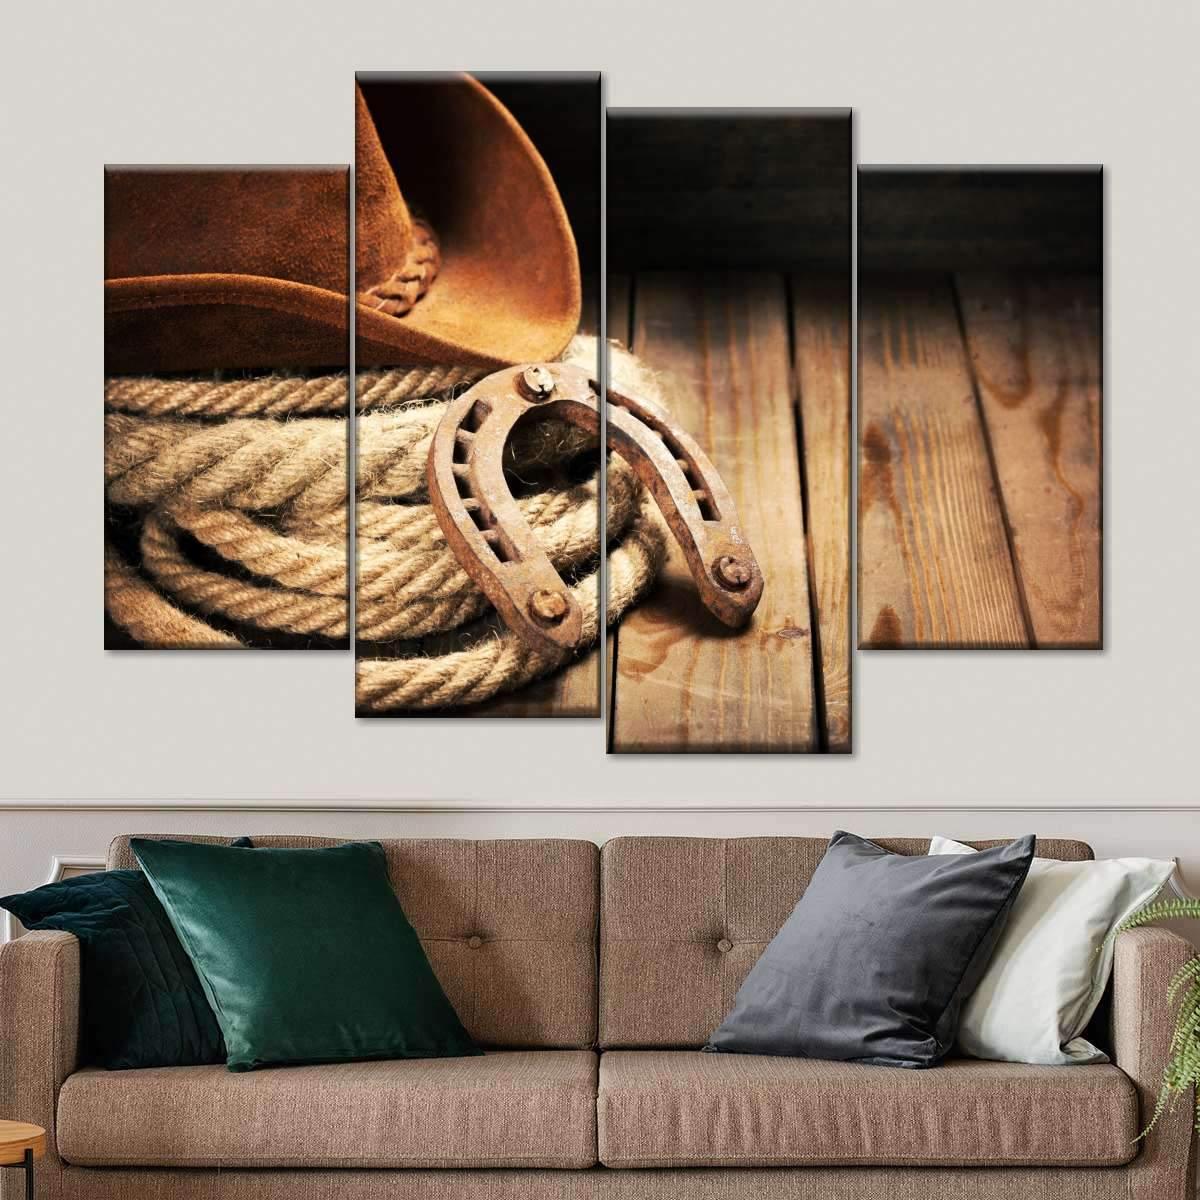 Cowboy's Gizmo Multi Panel Canvas Wall Art